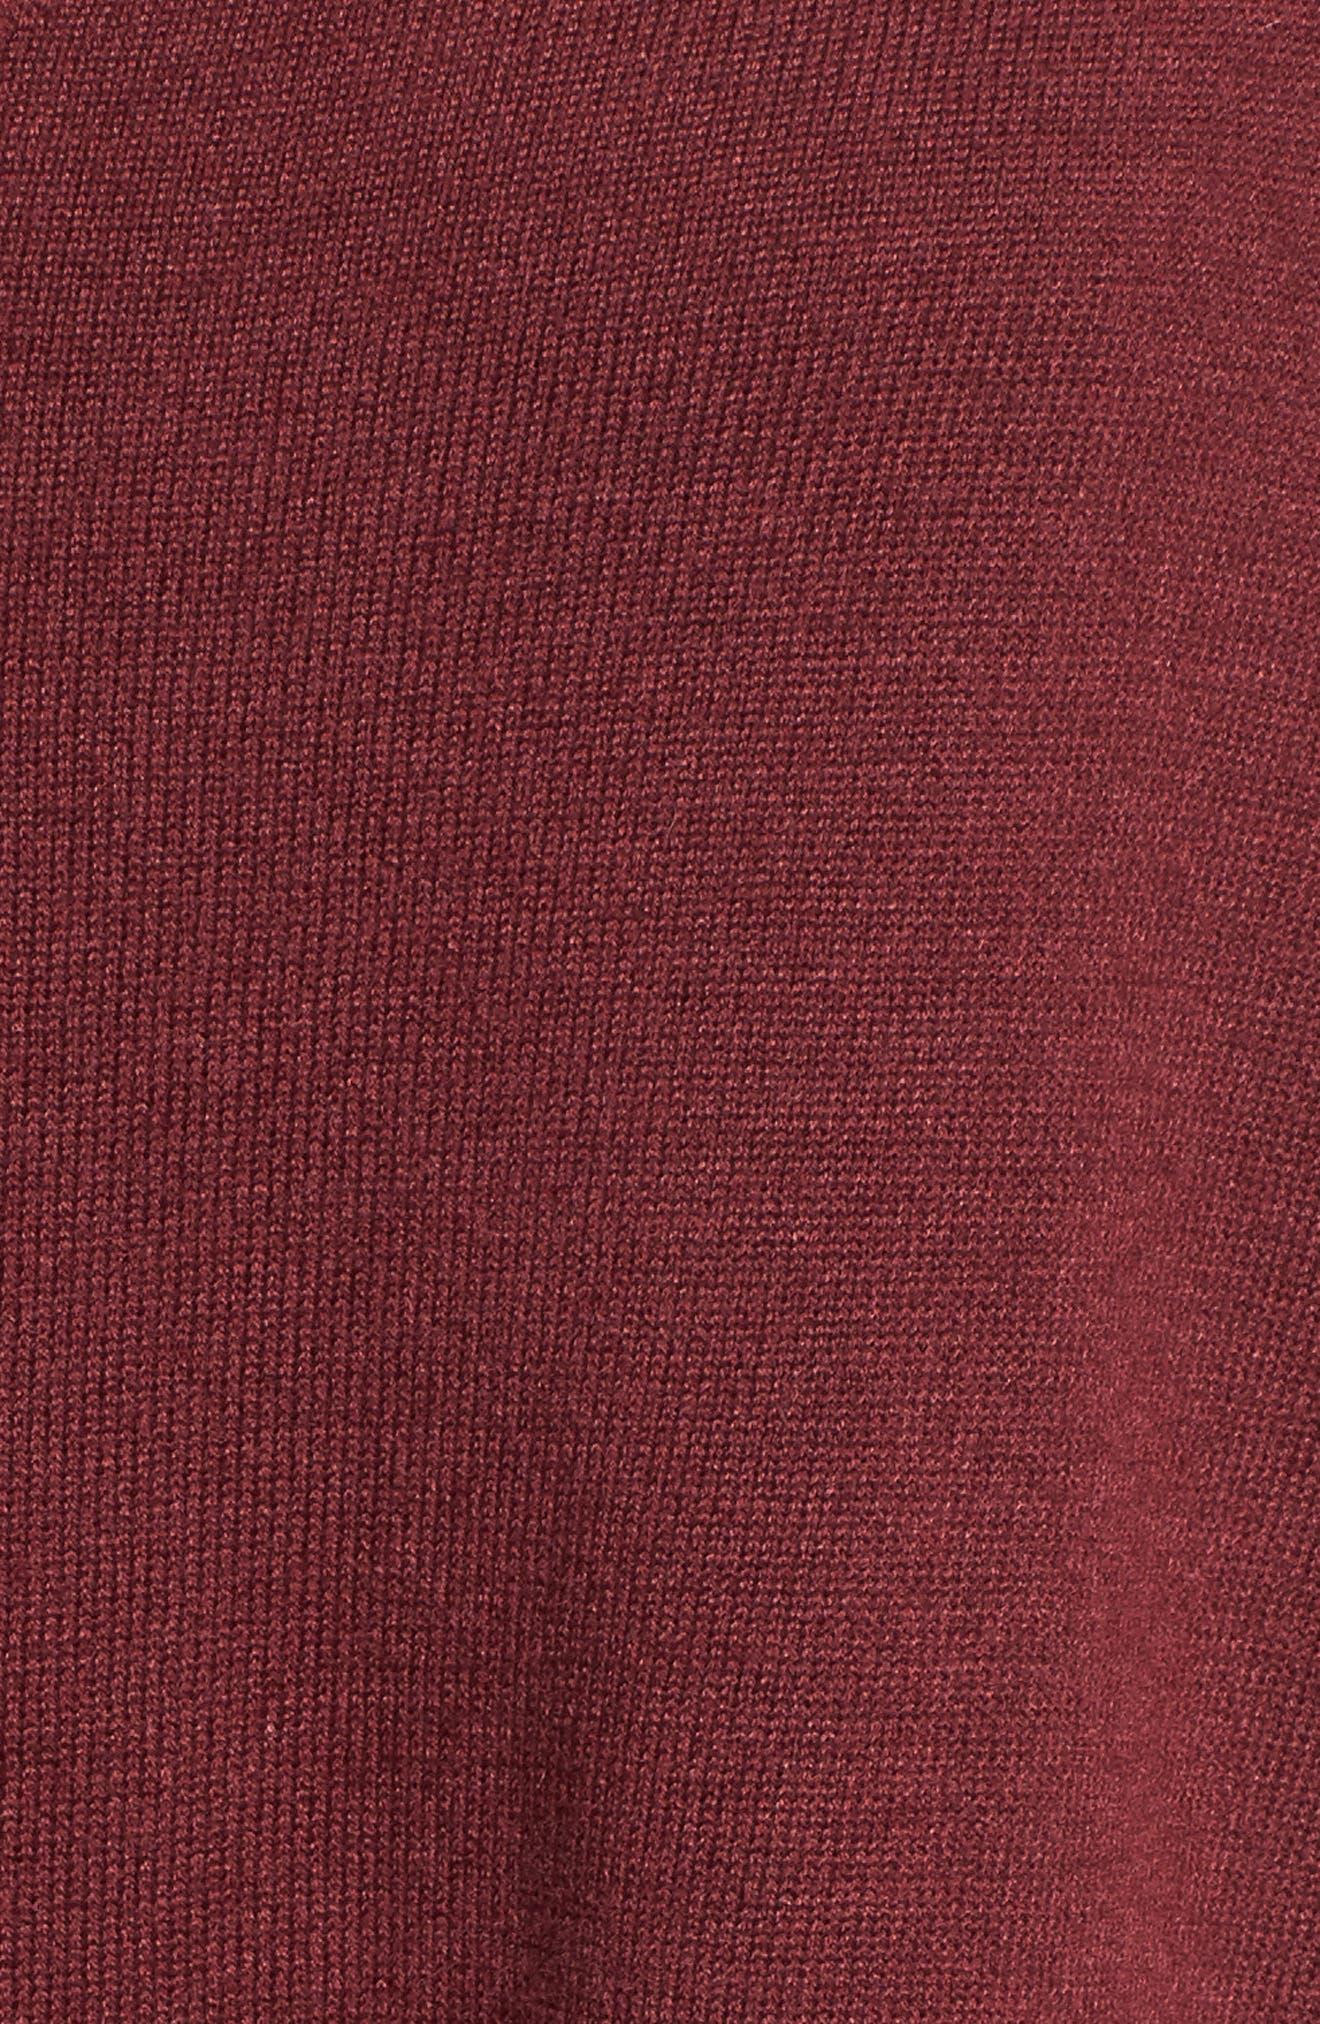 'Everyday' V-Neck Sweater,                             Alternate thumbnail 5, color,                             Burgundy London